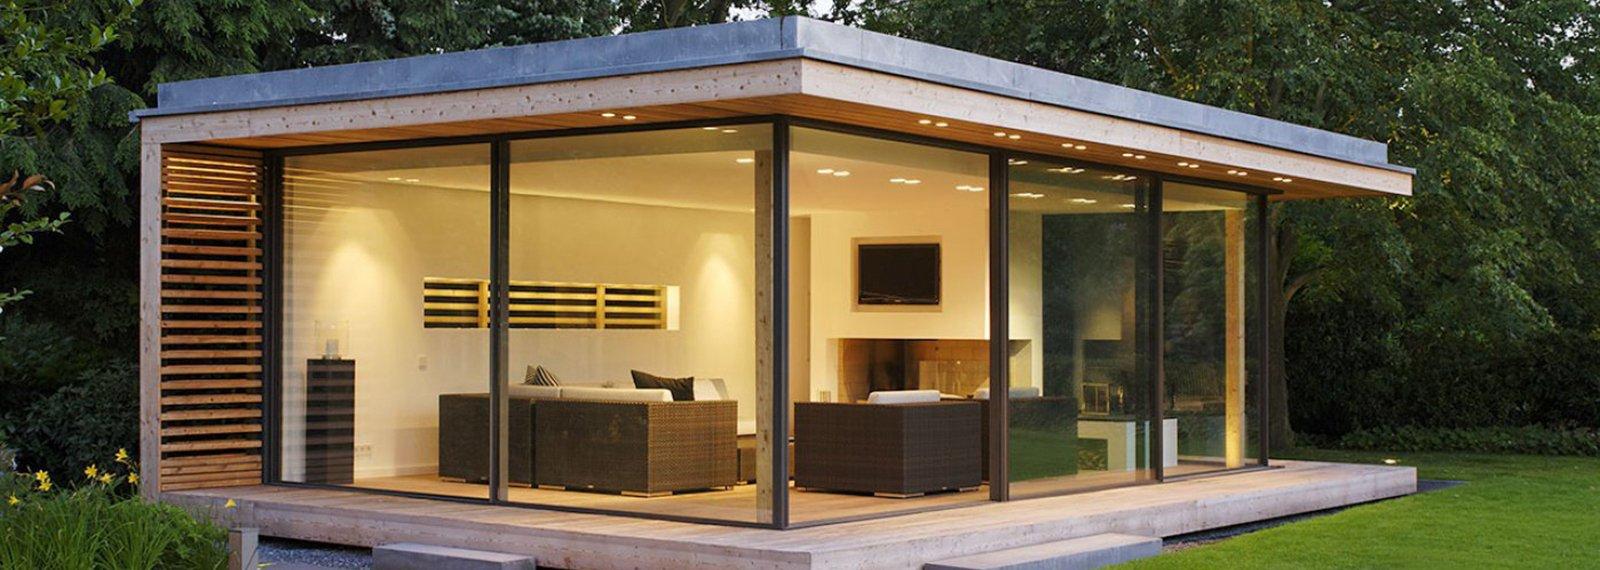 Studio De Jardin Bois Habitable Pool House Extension Maison serapportantà Abri De Jardin Habitable